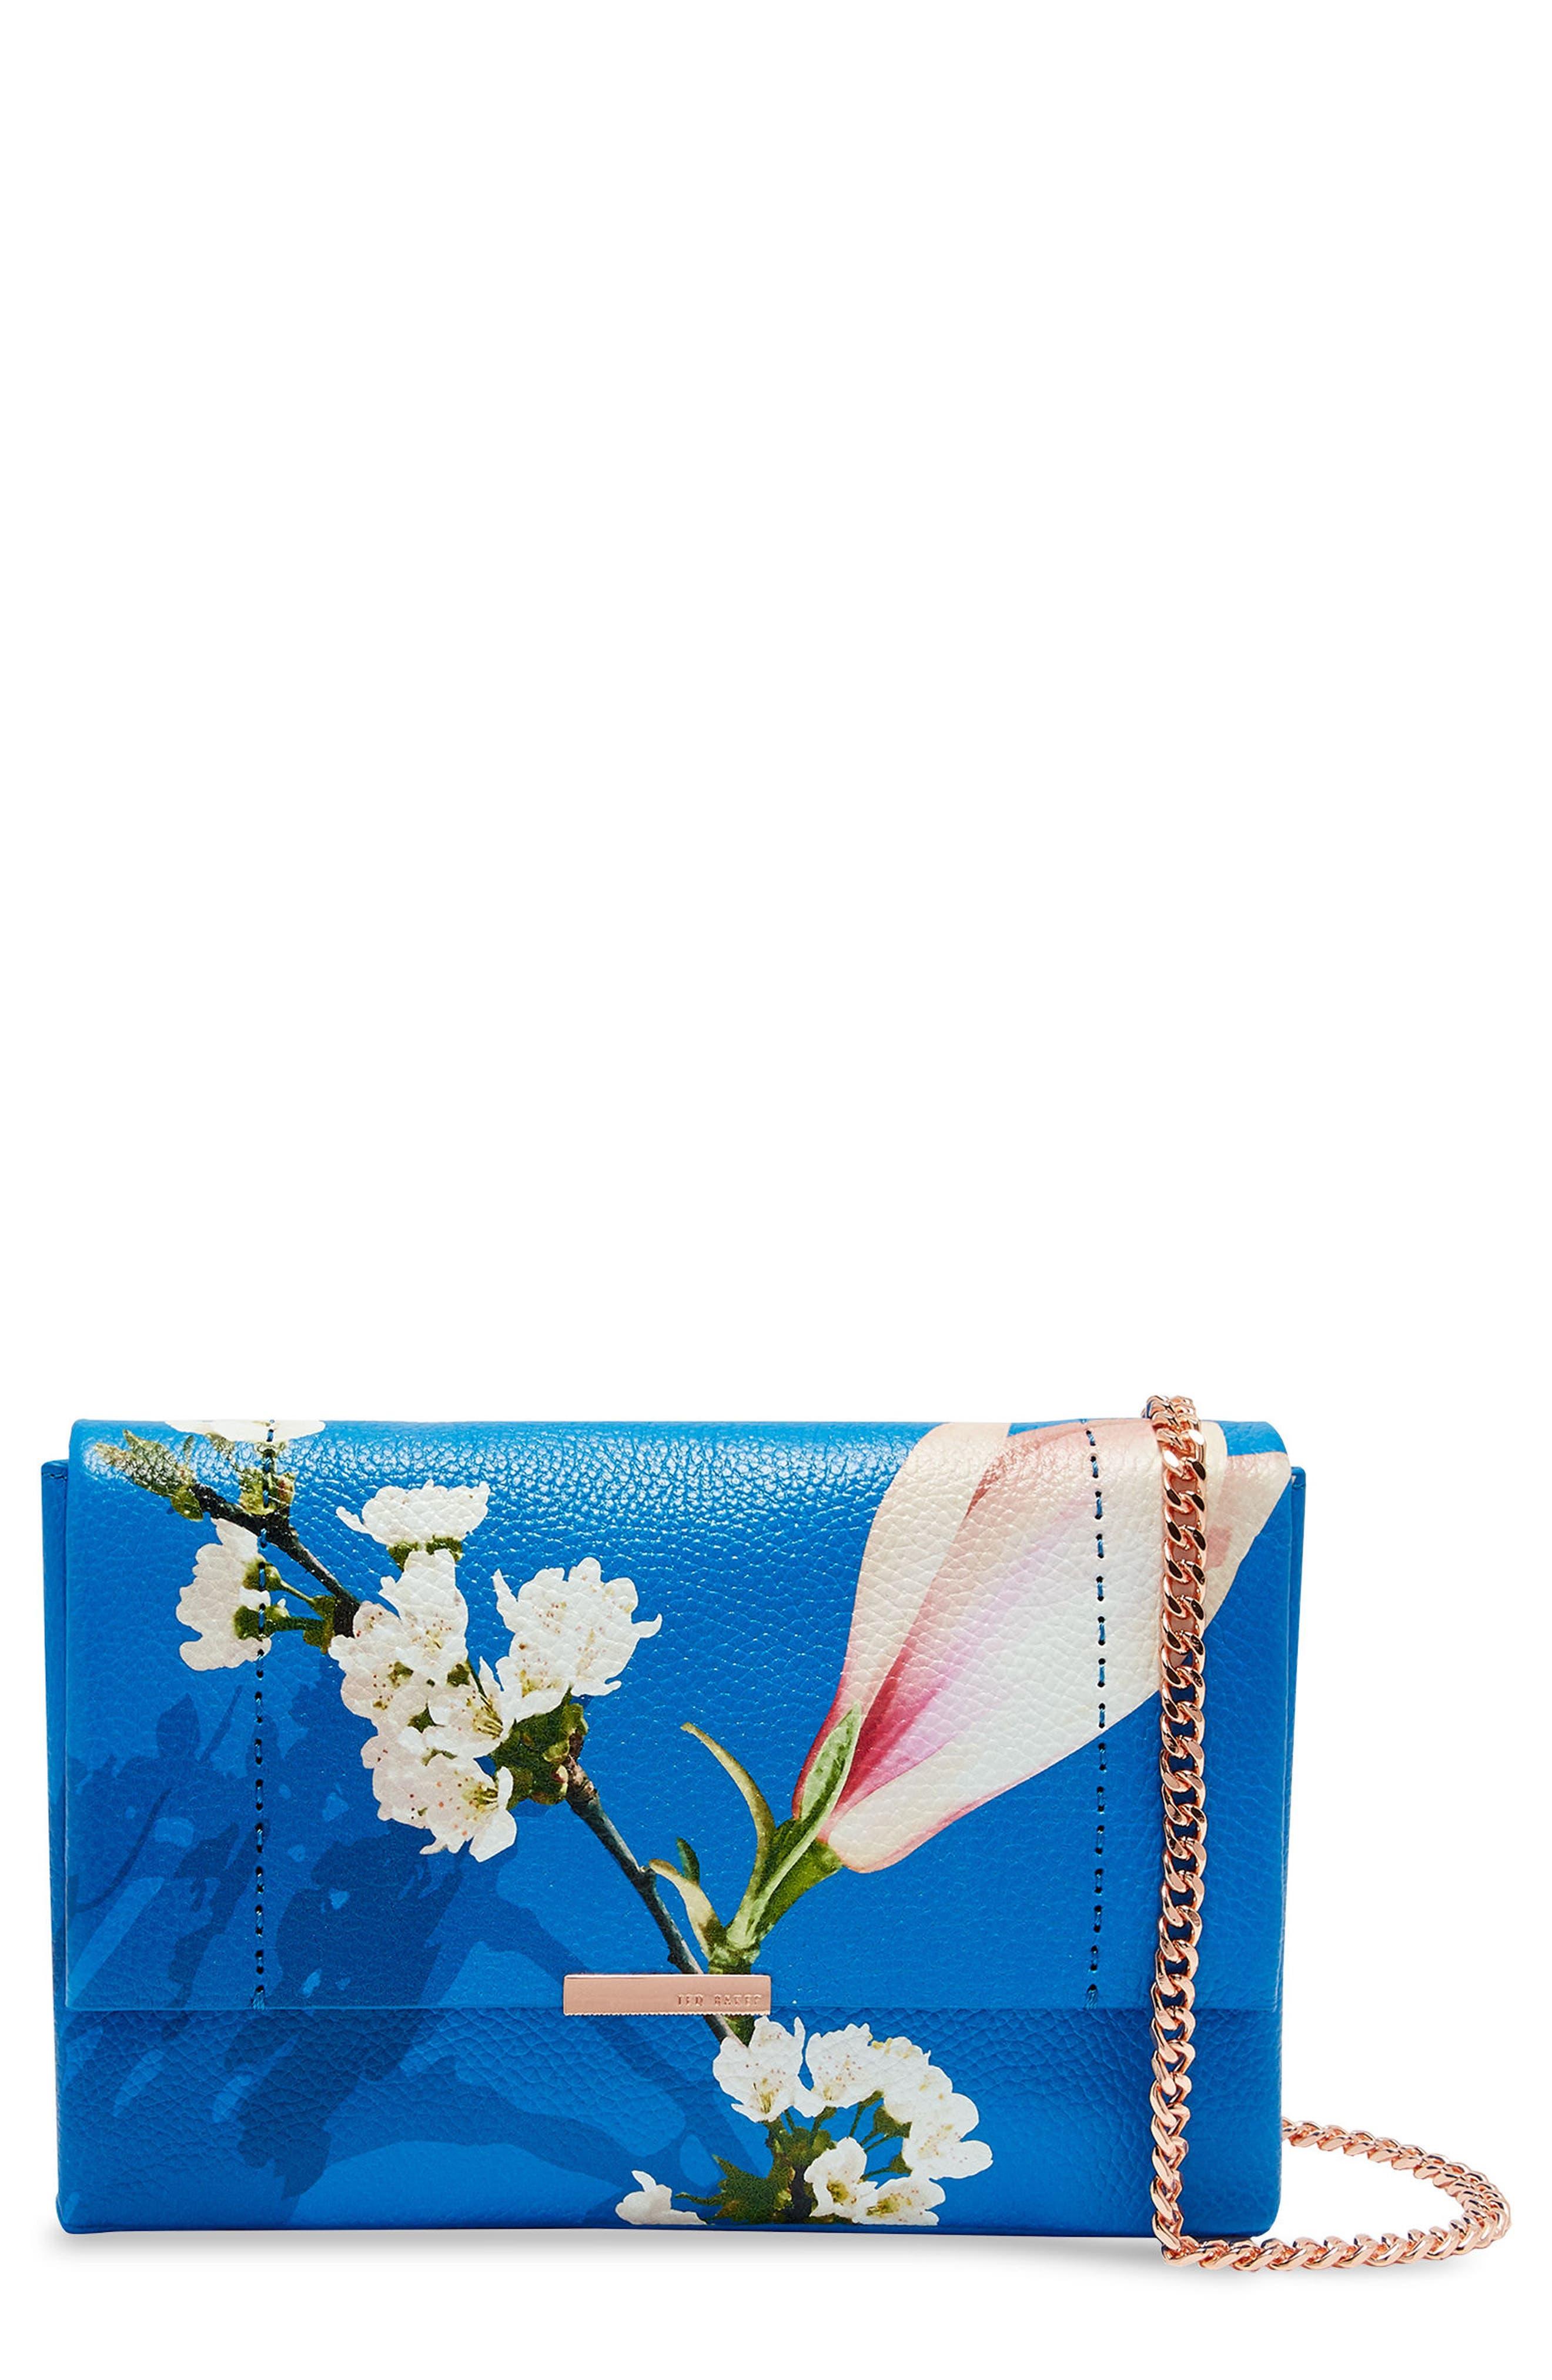 Haalle Harmony Leather Crossbody Bag,                         Main,                         color,